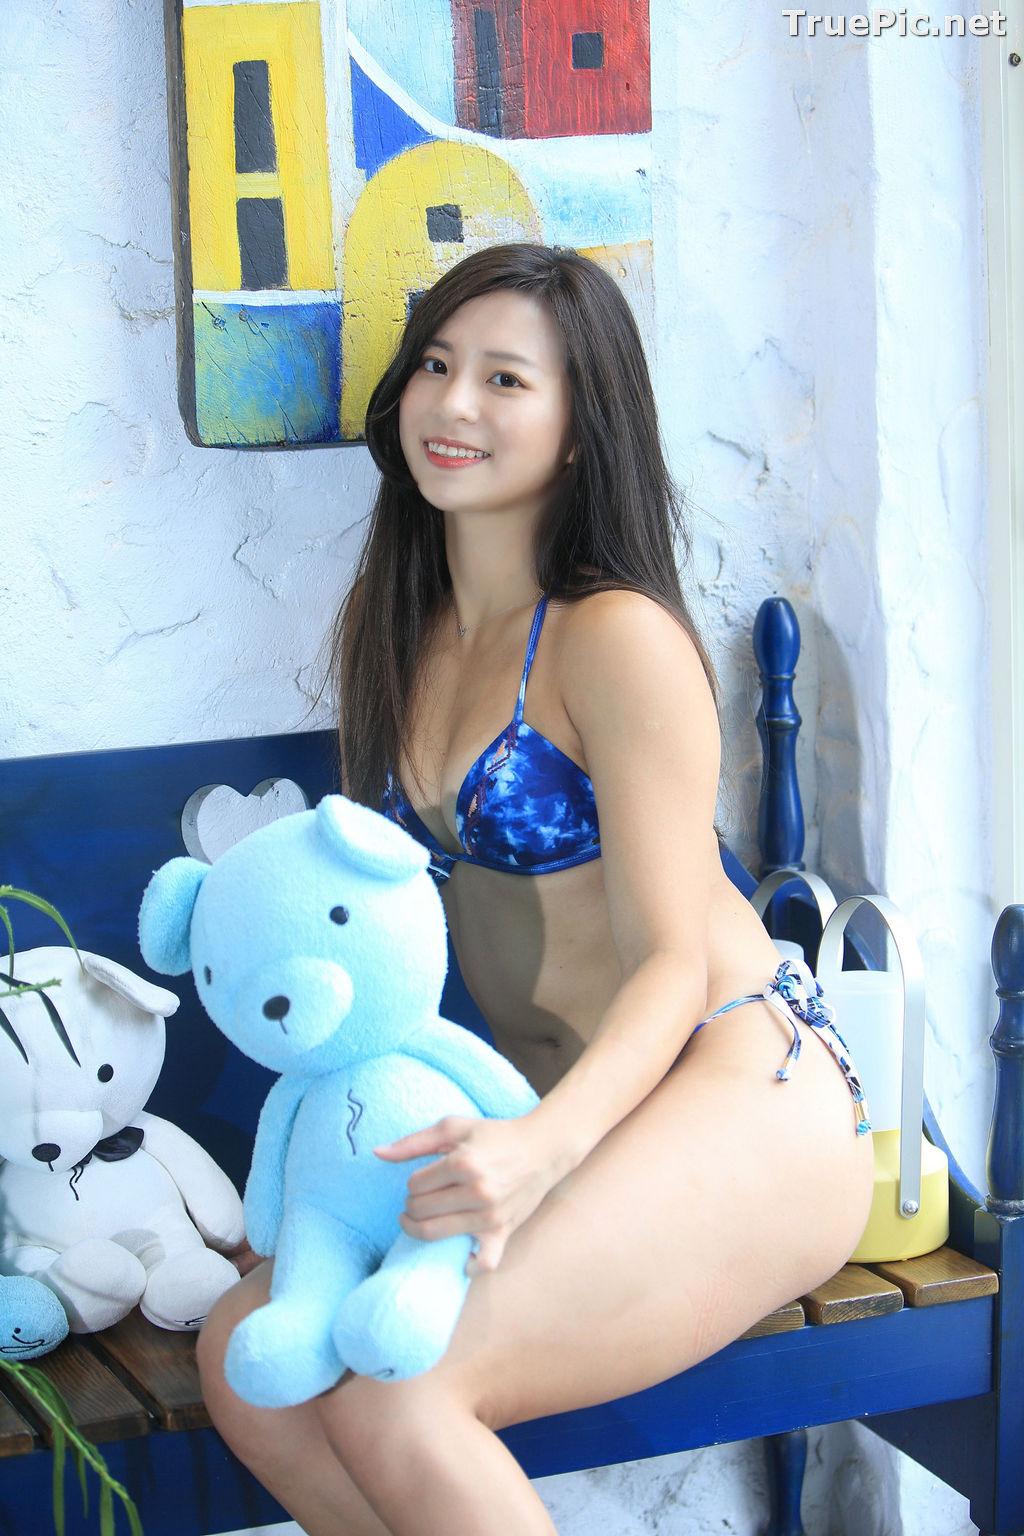 Image Taiwanese Model - Shelly - Beautiful Bodybuilding Bikini Girl - TruePic.net - Picture-9